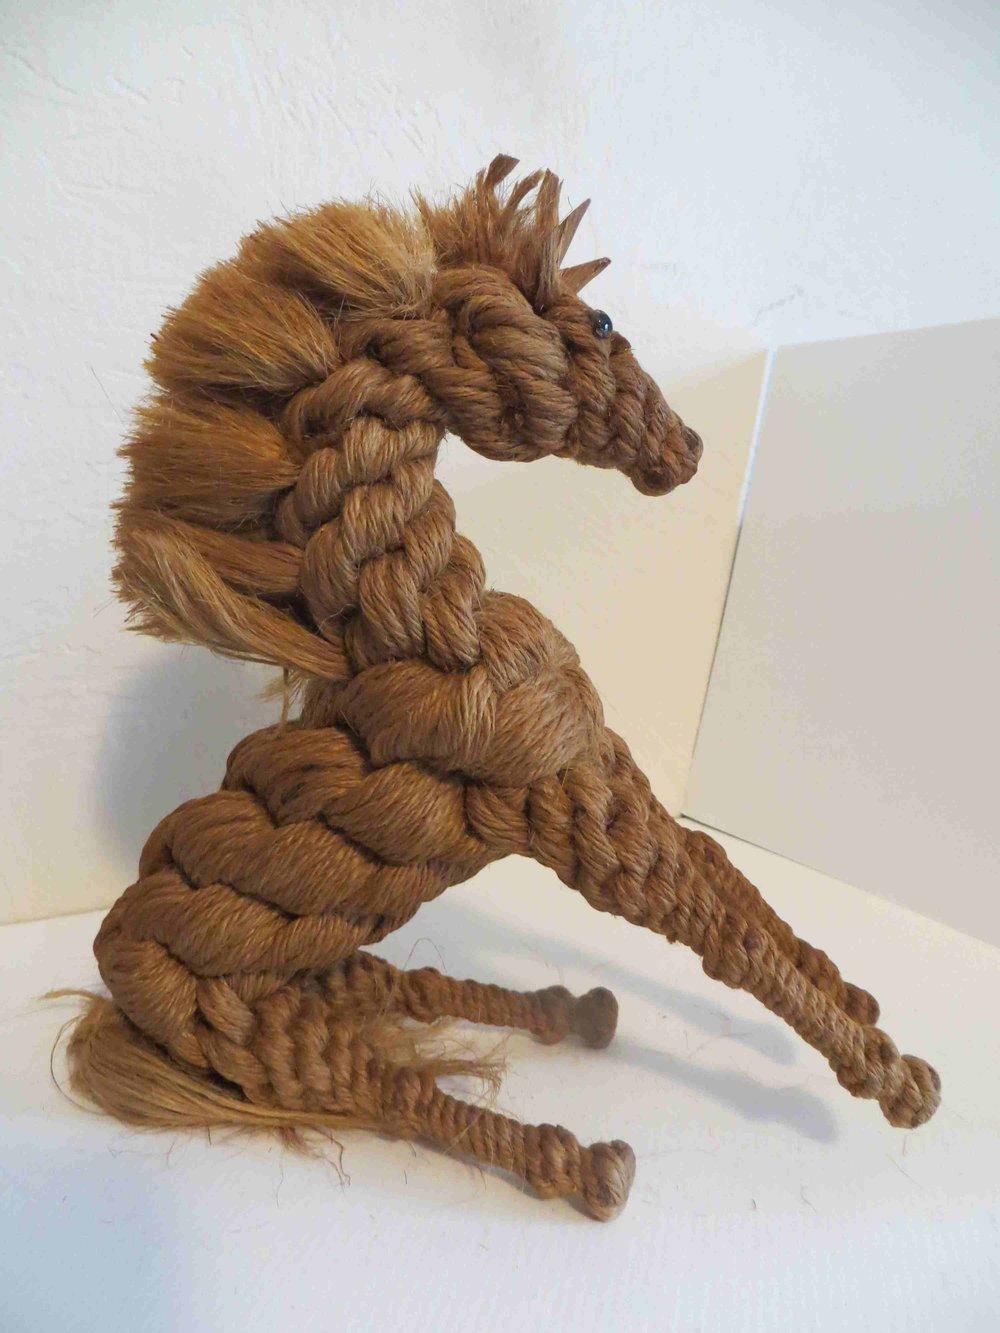 Twine Horse sculpture by Raiford FL INmate ARtist-021.jpg